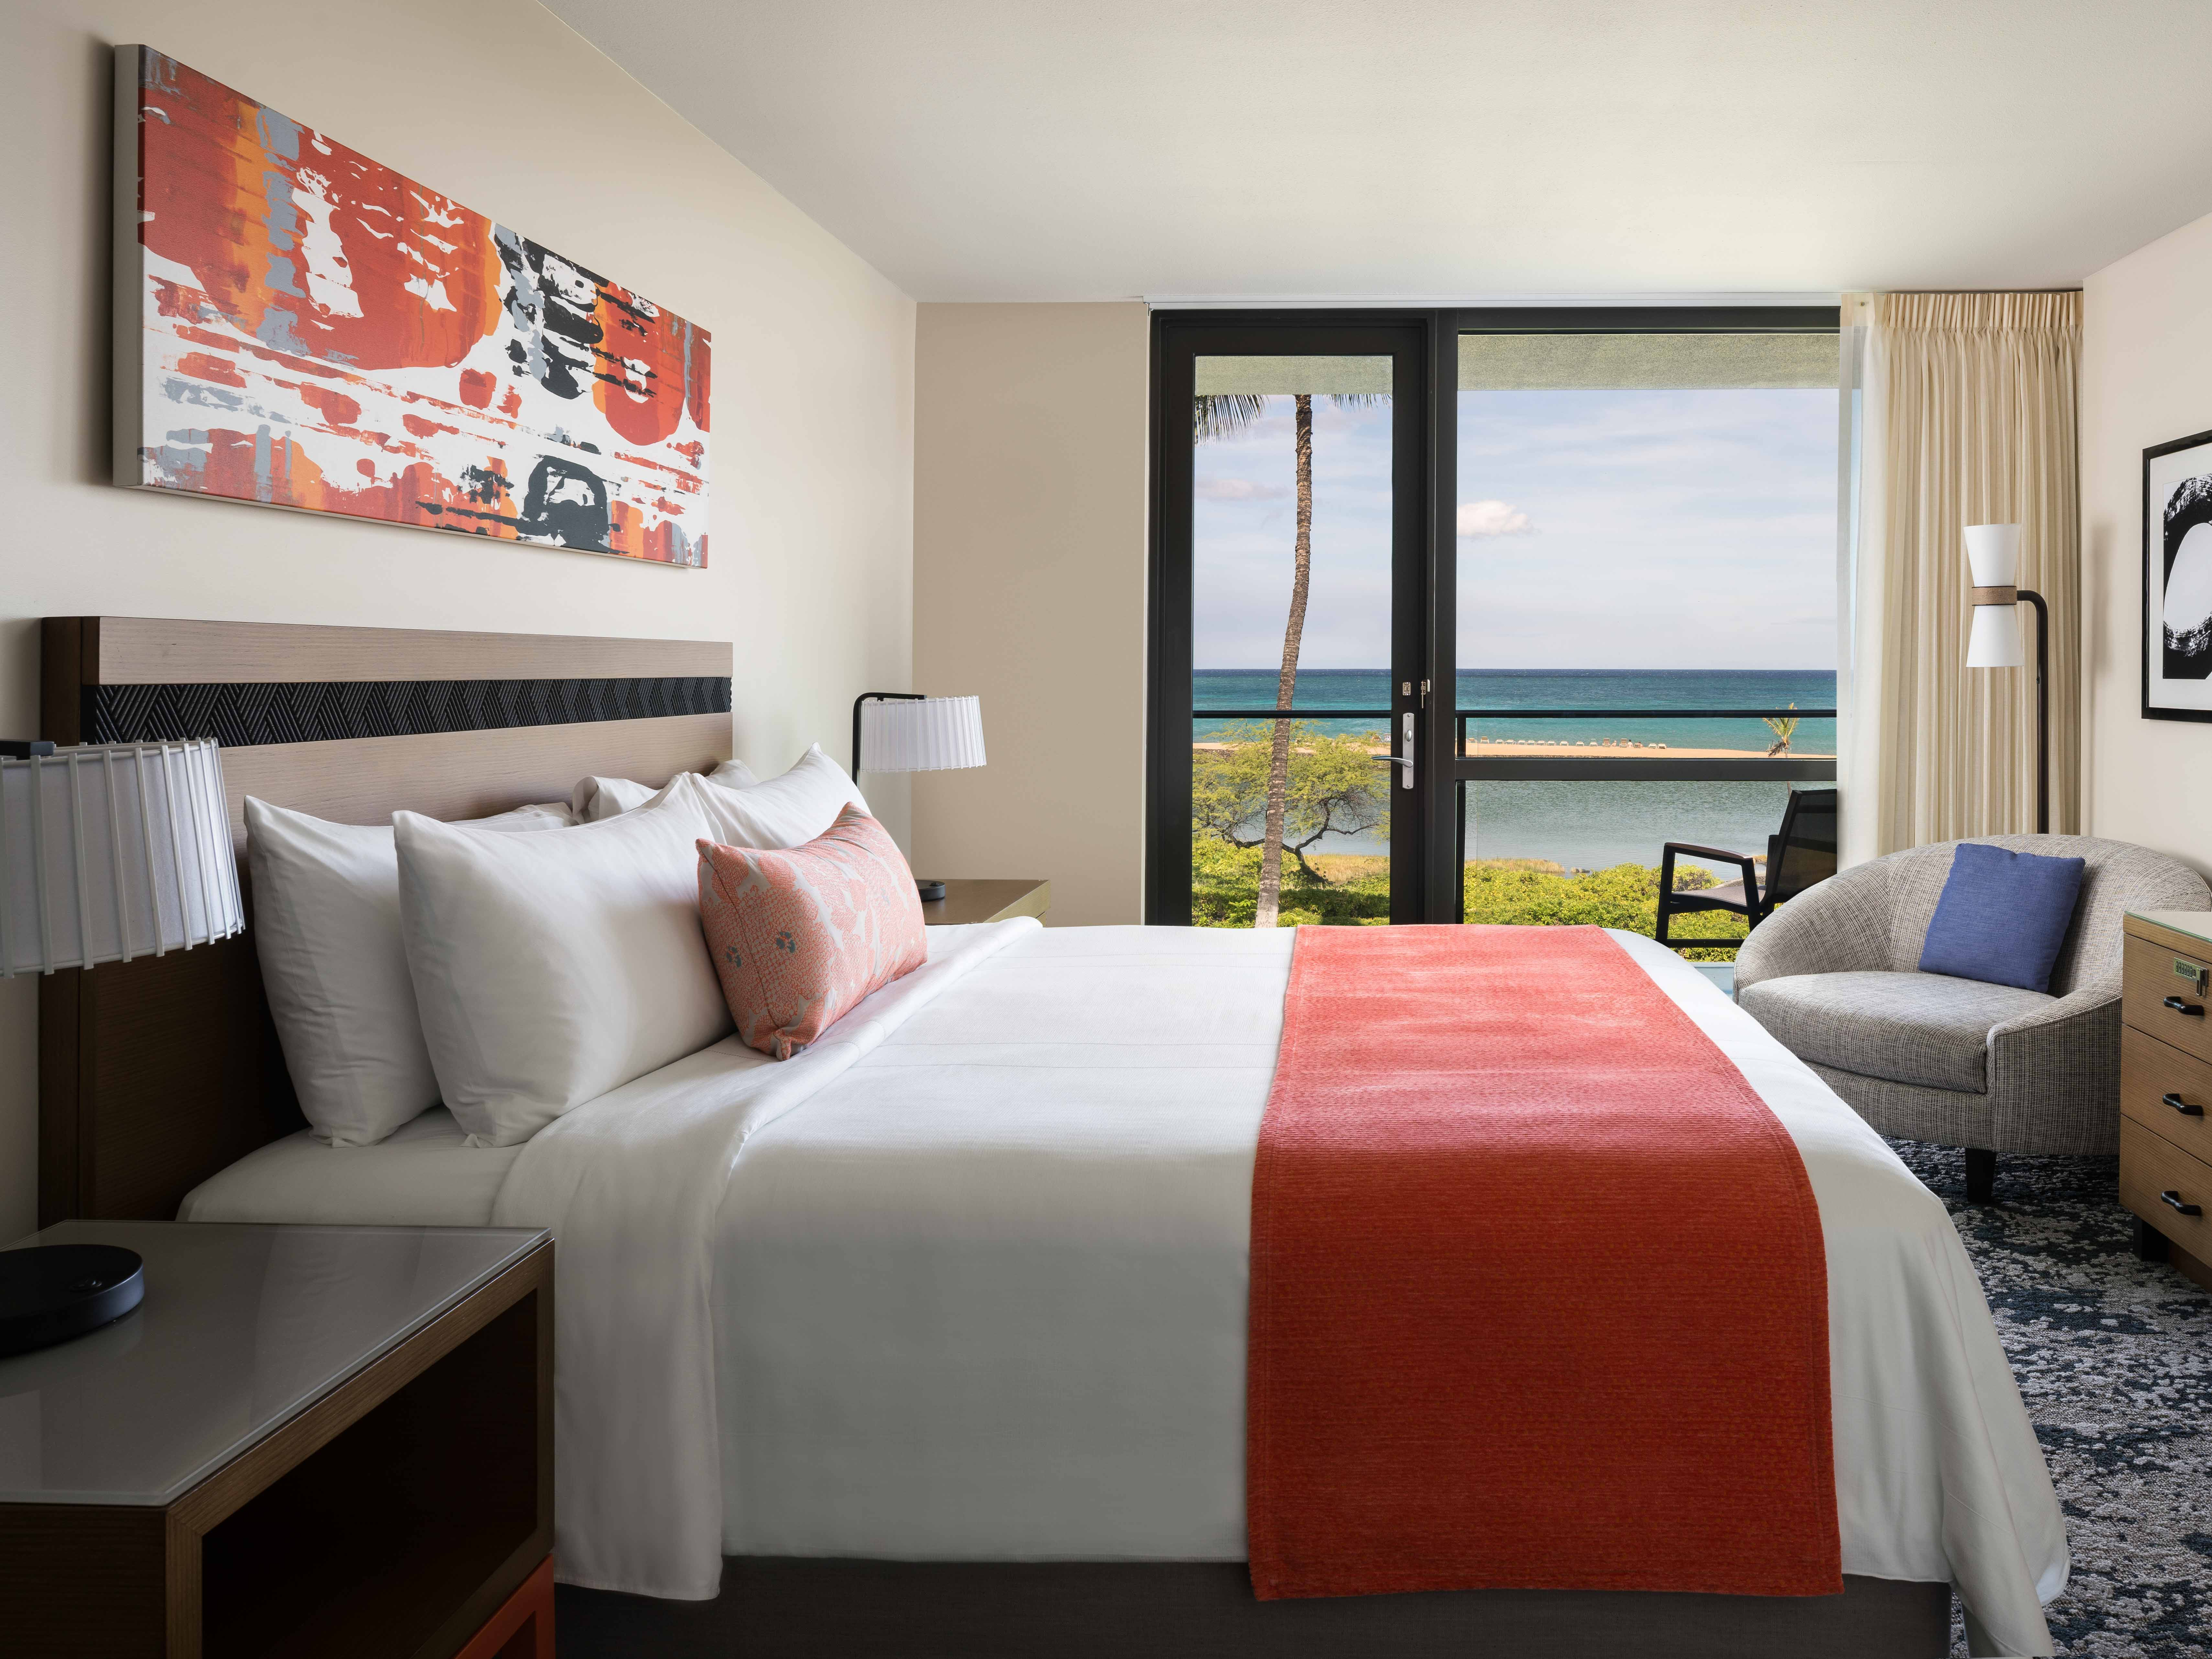 Marriott's Waikoloa Ocean Club Master Bedroom. Marriott's Waikoloa Ocean Club is located in Waikoloa Beach, Big Island, Hawai'i United States.